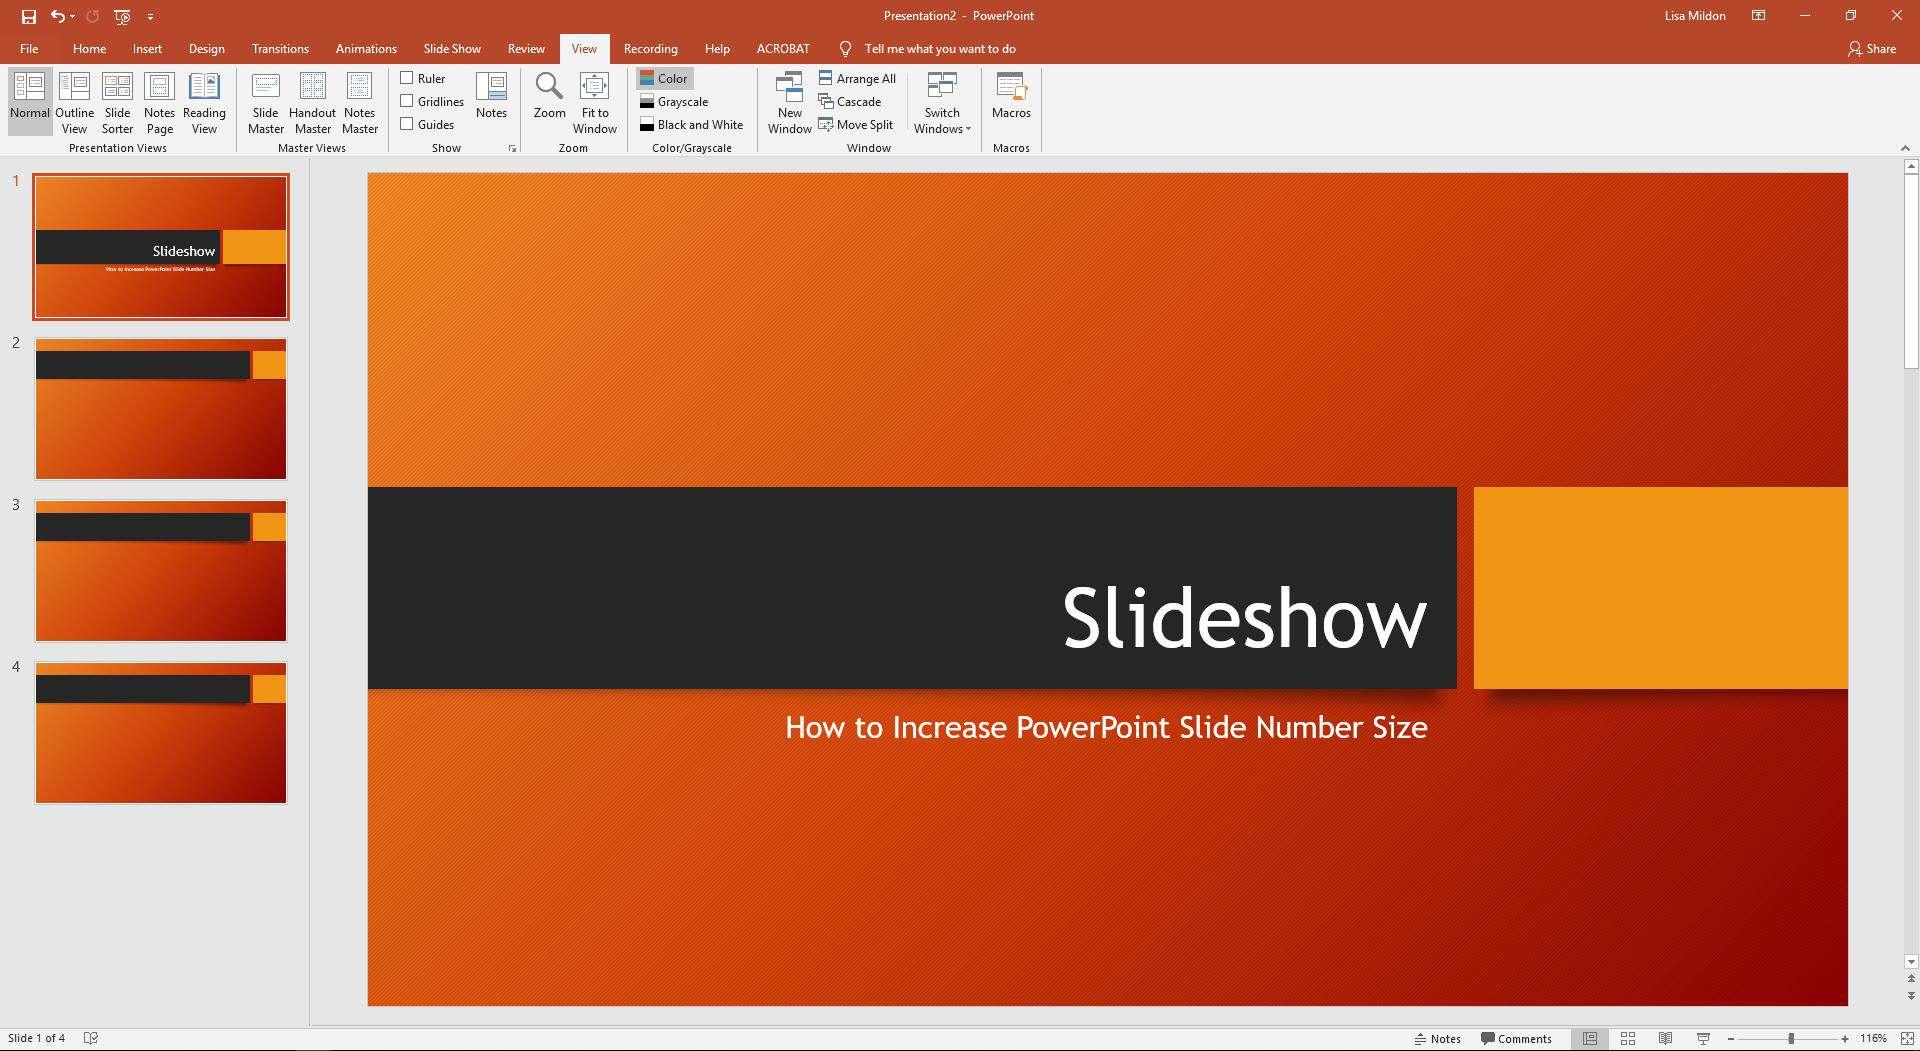 PowerPoint slideshow displaying View tab.